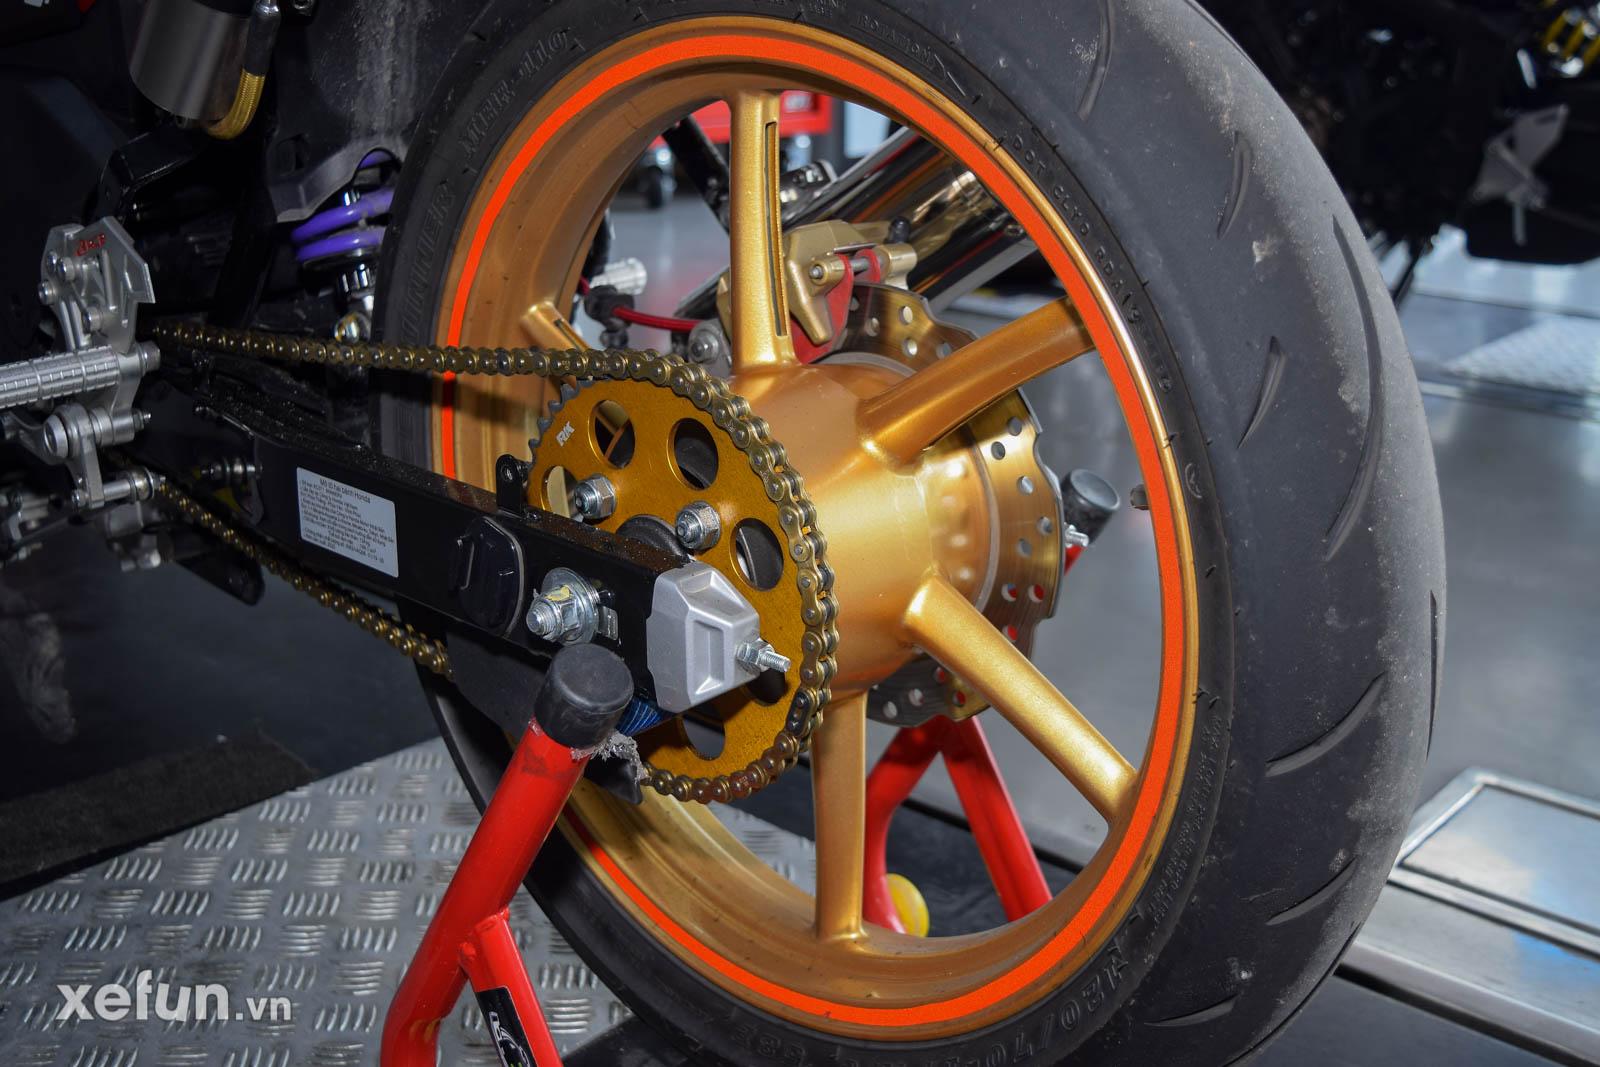 Mâm racing boy Honda Winner X 2021 độ track_xefun